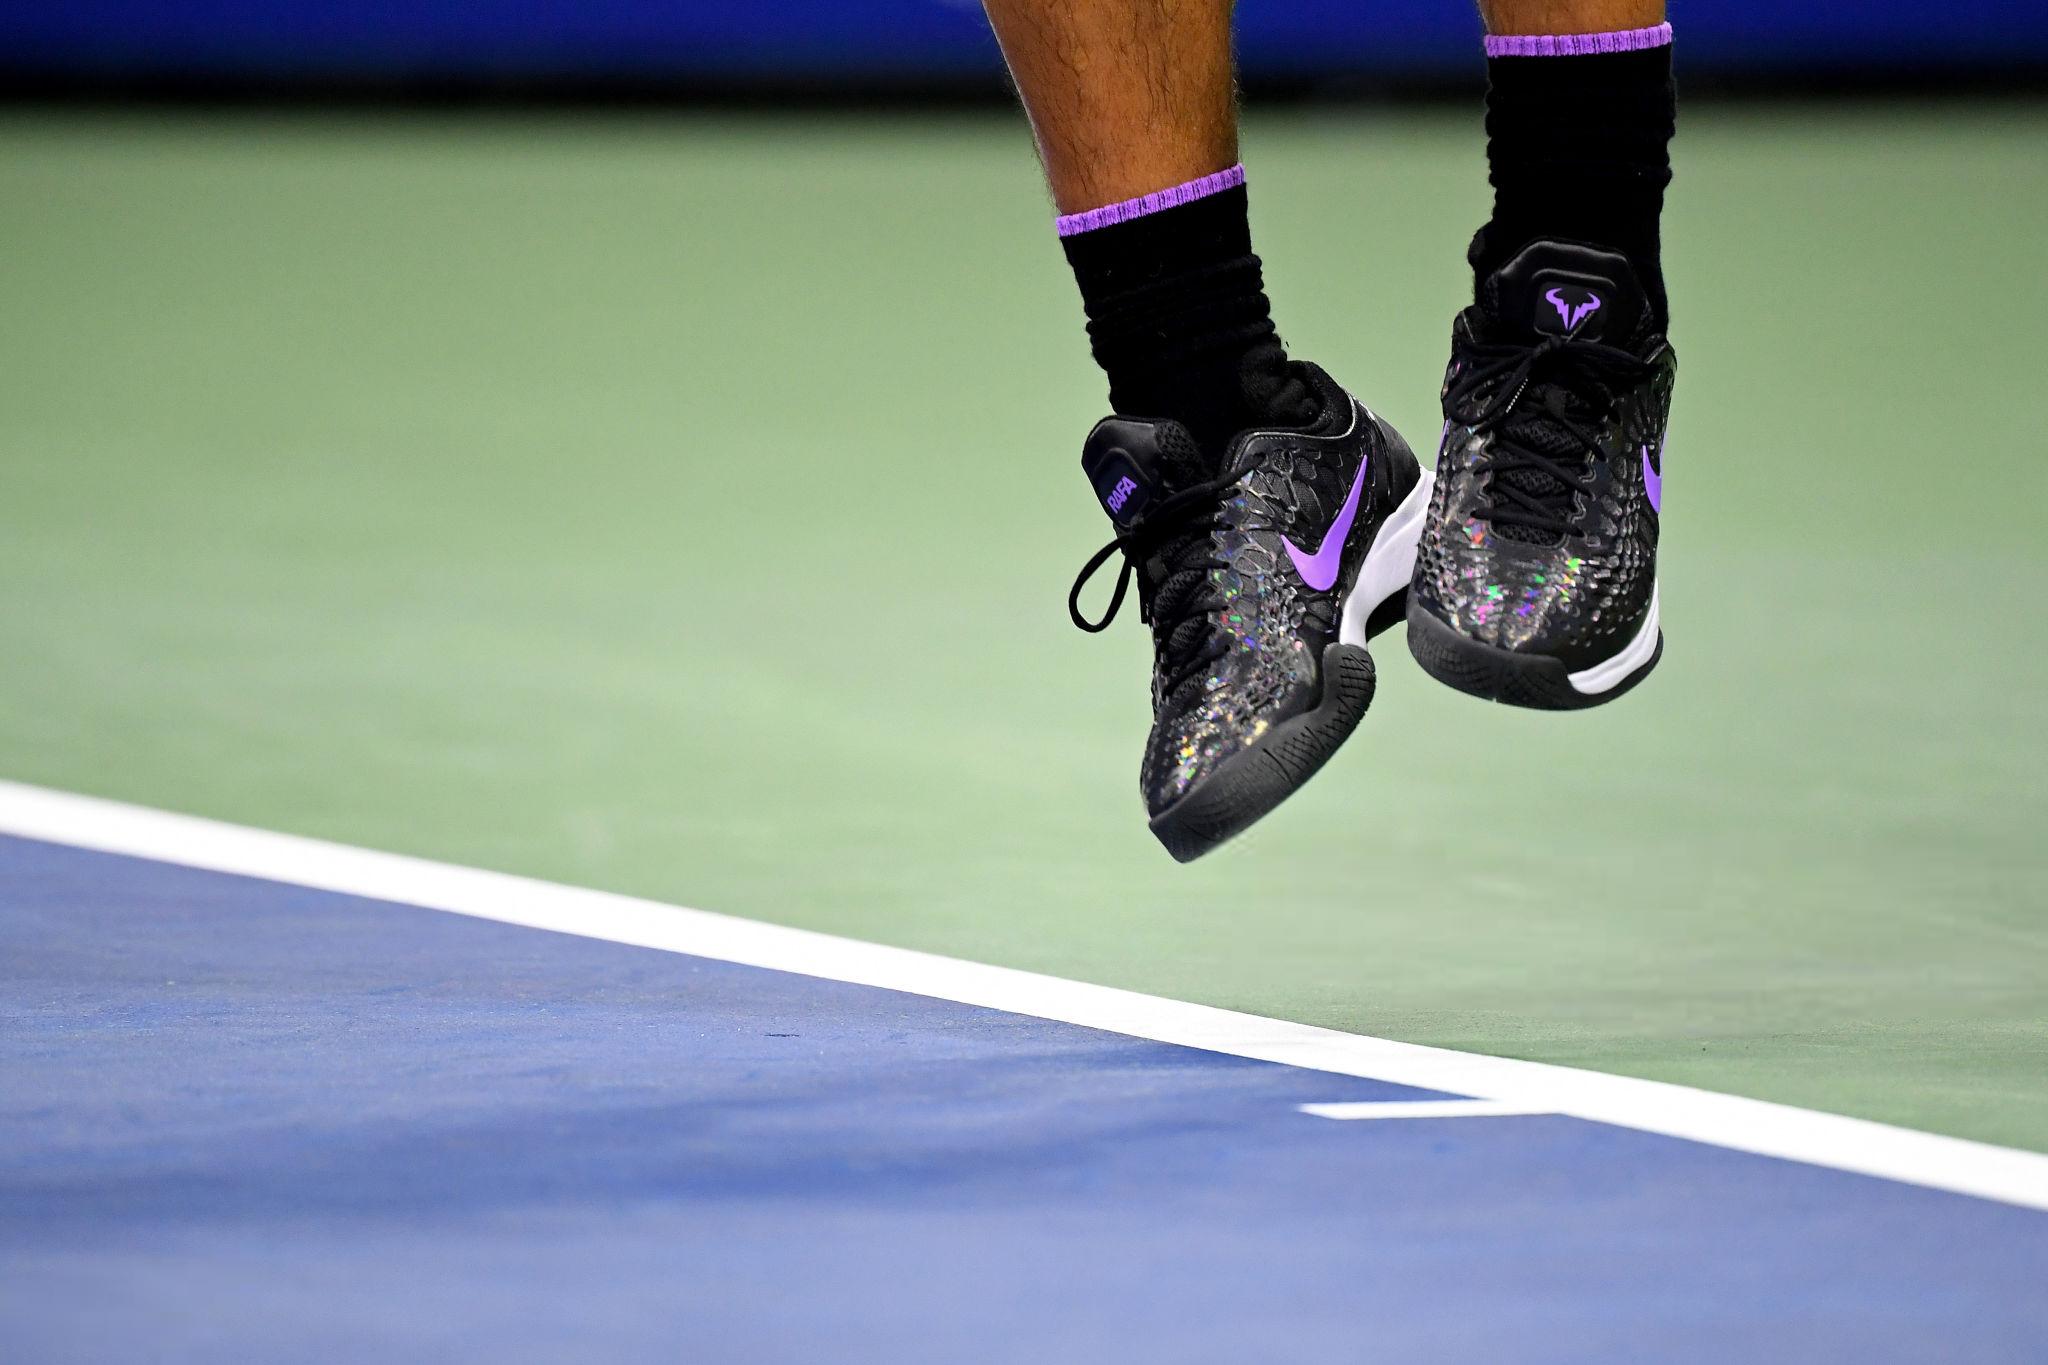 Rafael Nadal 2019 Nike Shoes Us Open Photo Rafael Nadal Fans